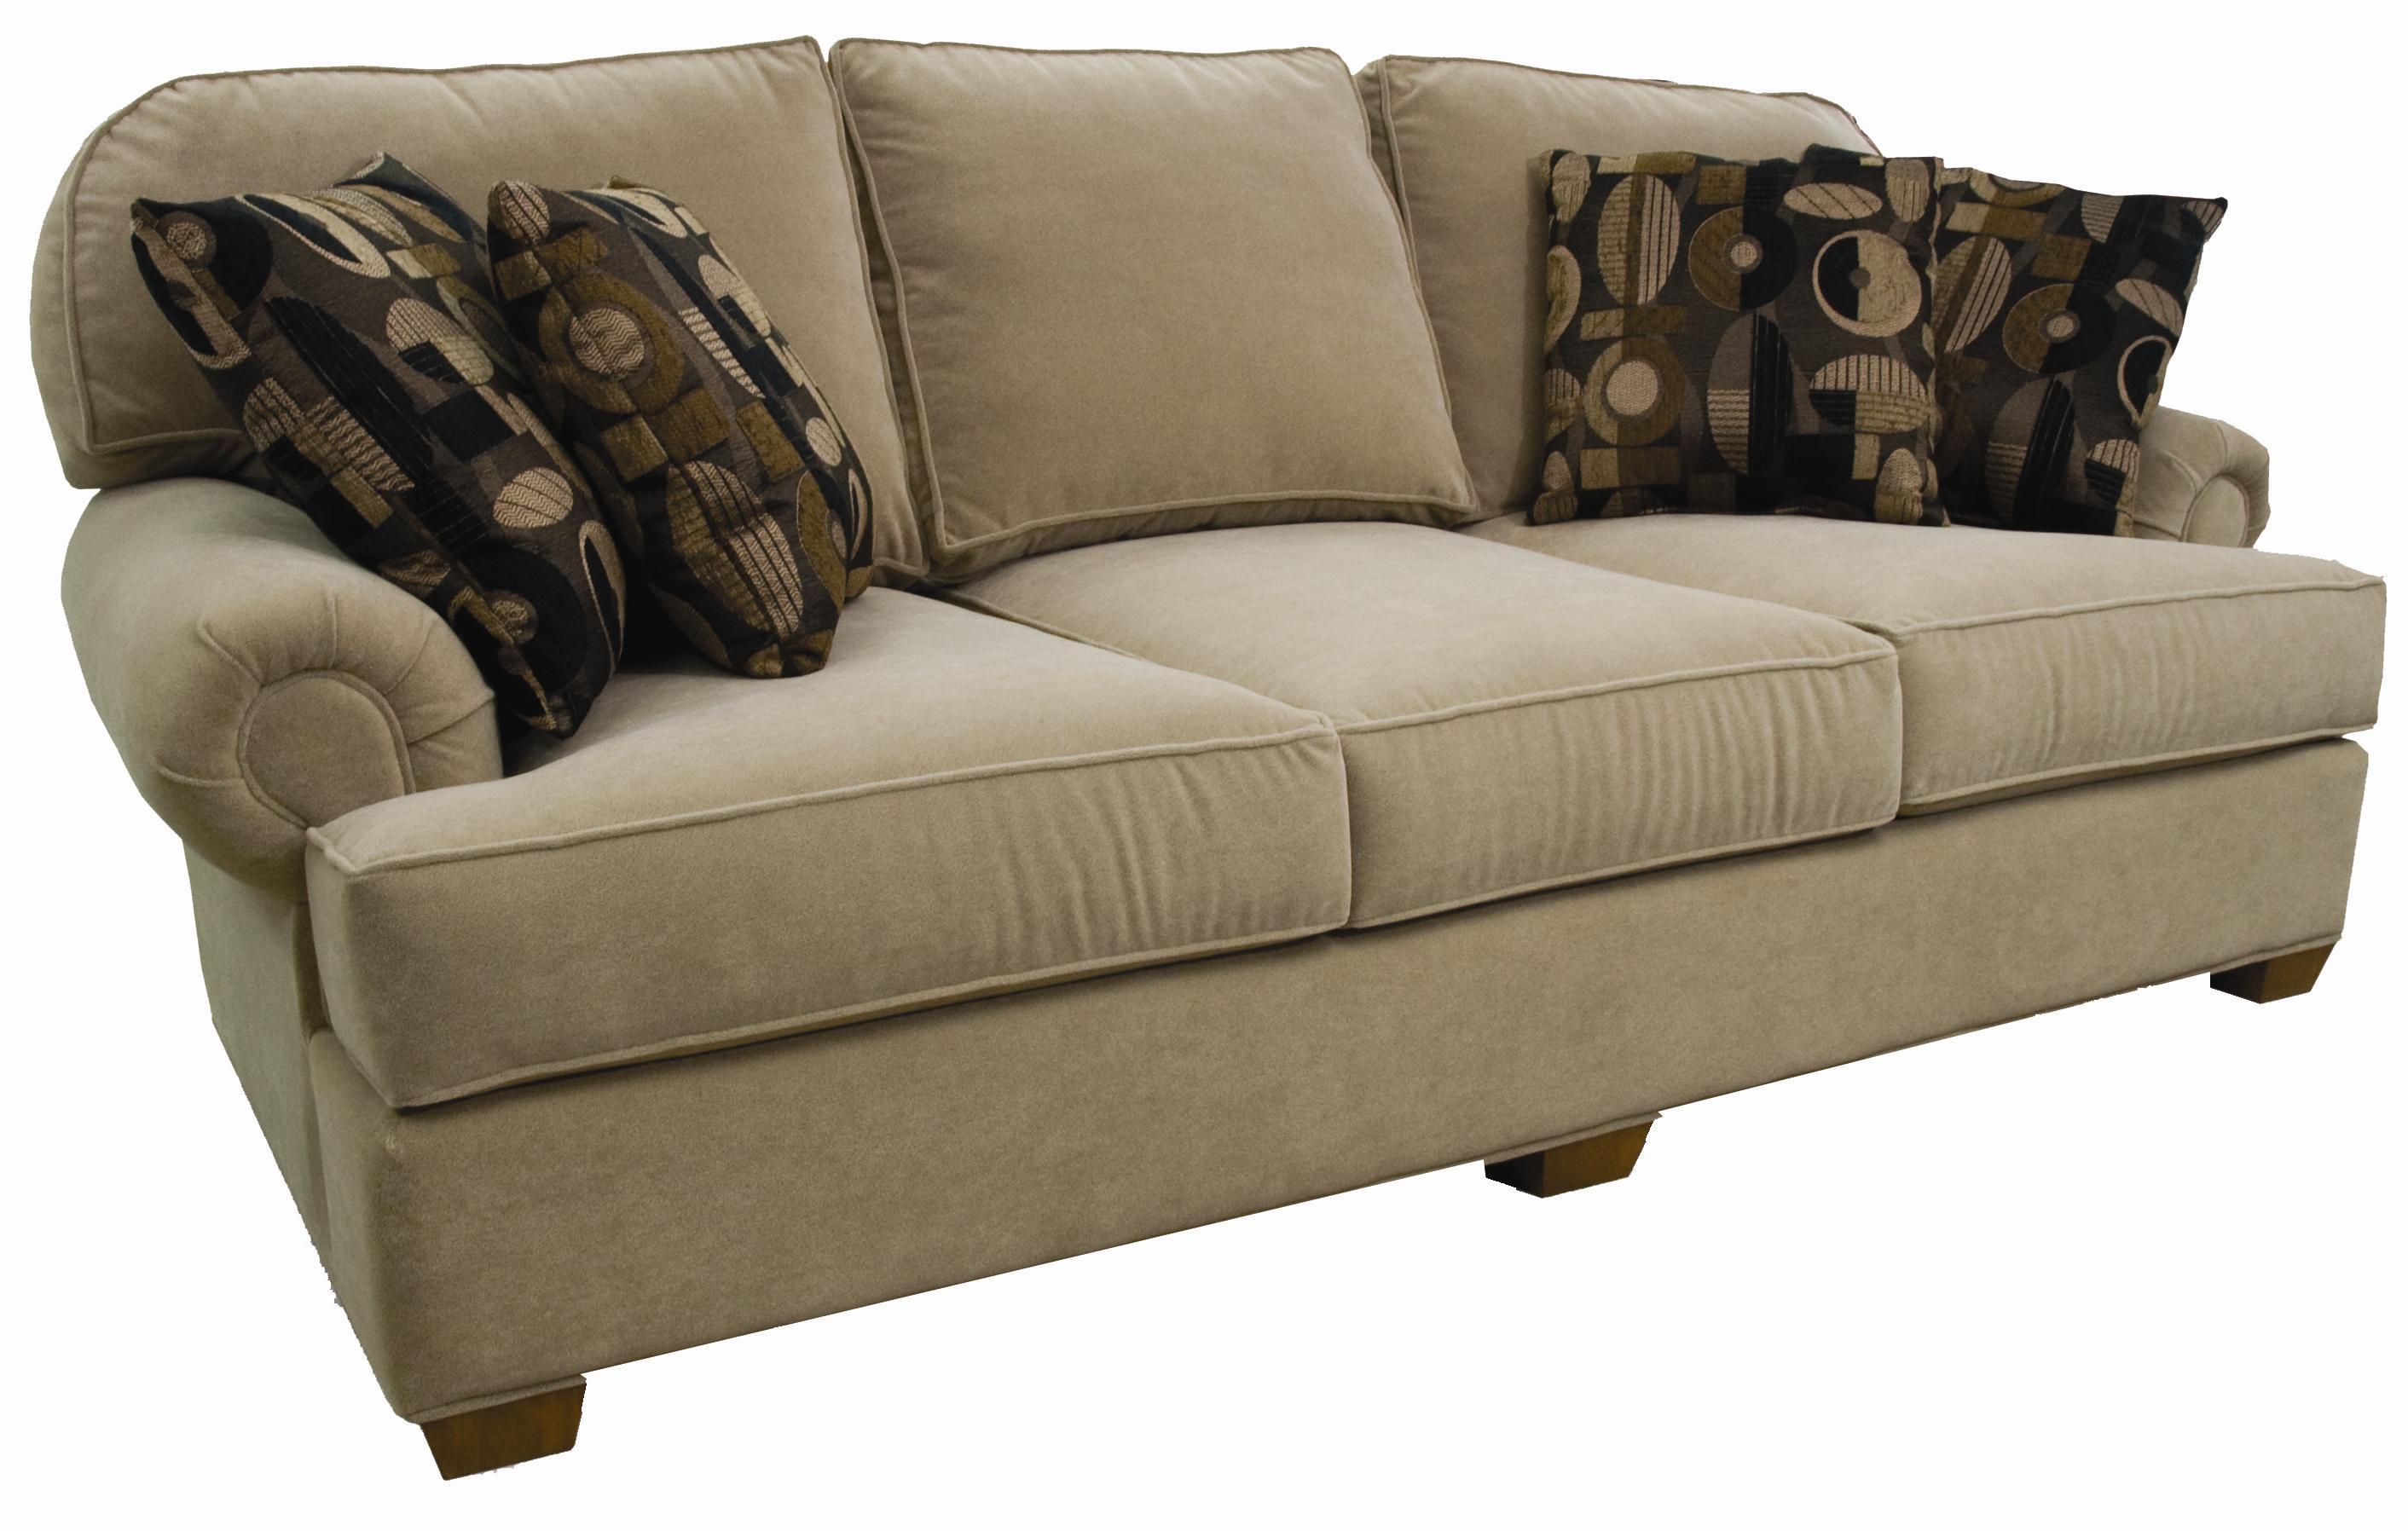 48 Sofa by Lancer at H.L. Stephens